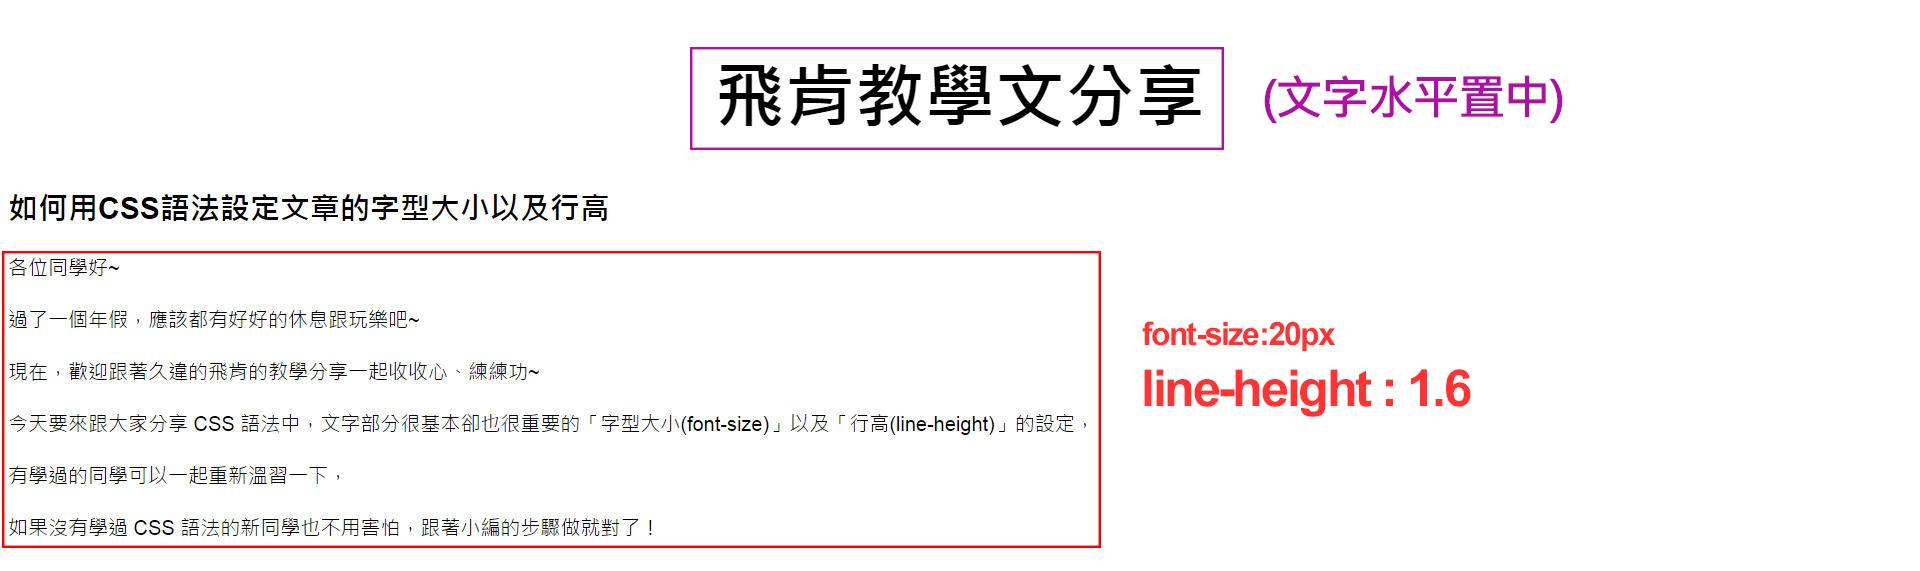 CSS 語法 - 網頁設計  - CSS 教學 - 基本文字設定 : font-size 與 line-height - p8_2